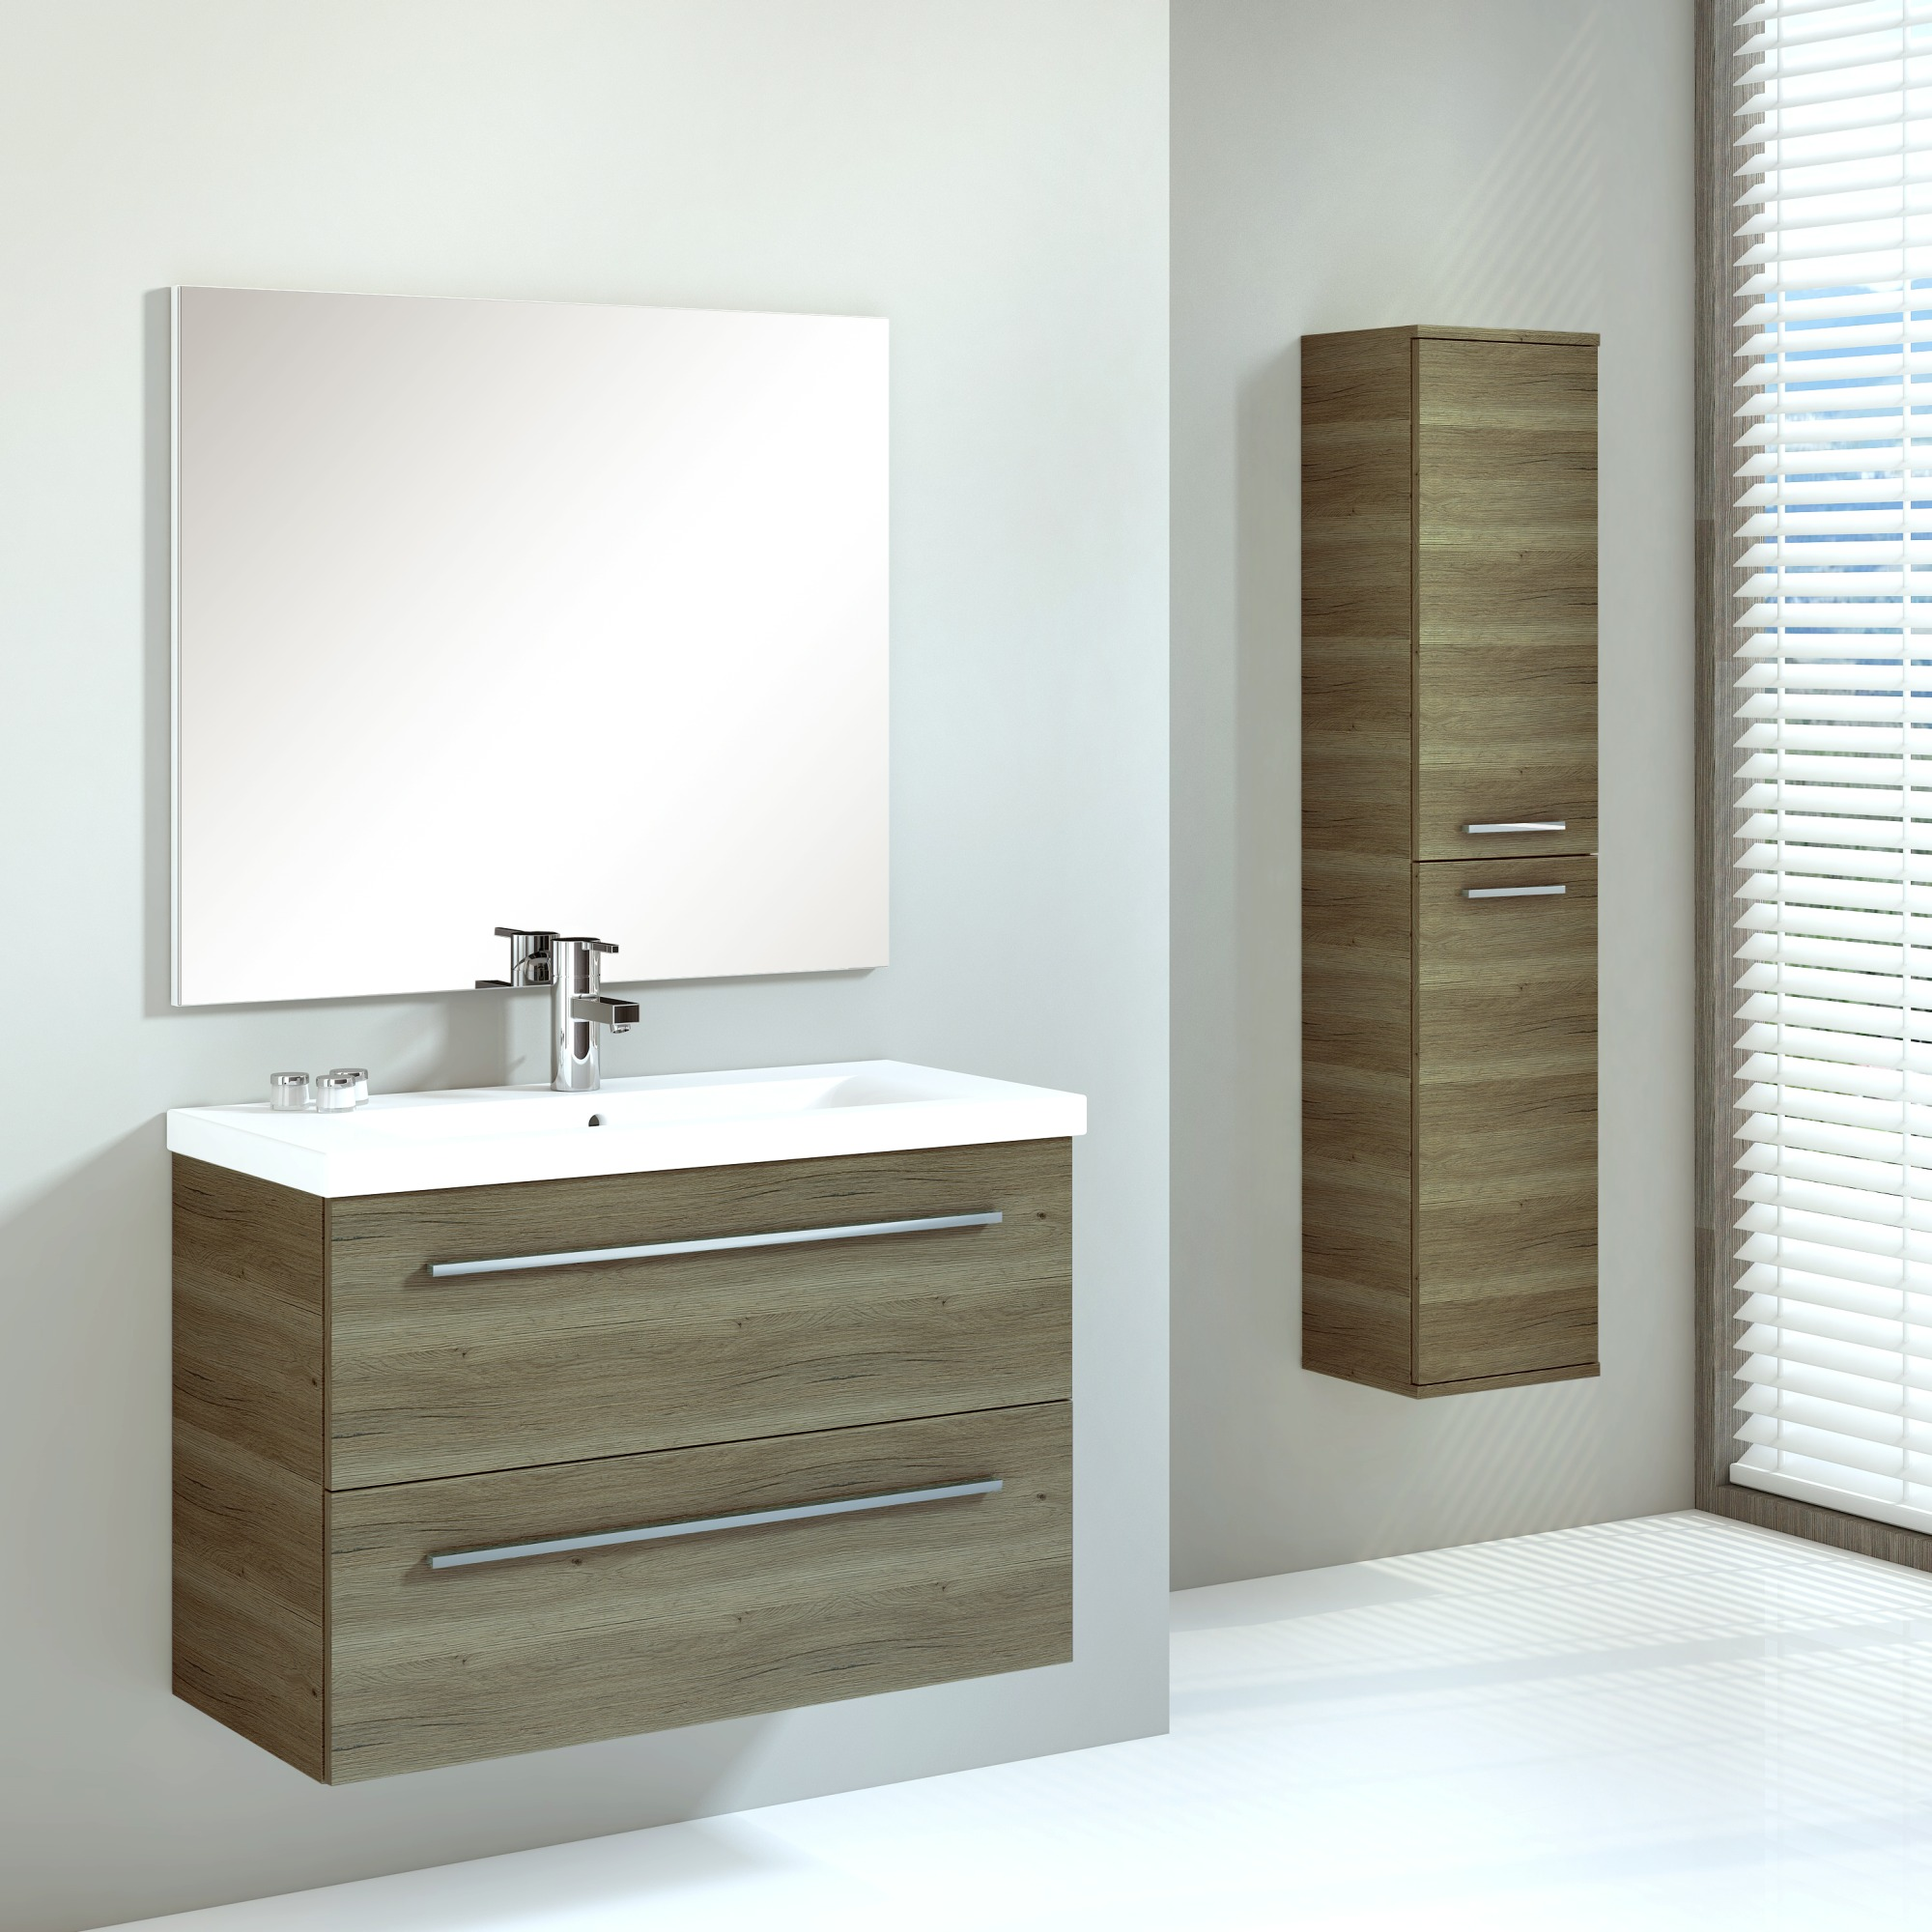 Meuble de salle de bains hera handson 80 cm bois set avec for Armoire de salle de bain bois